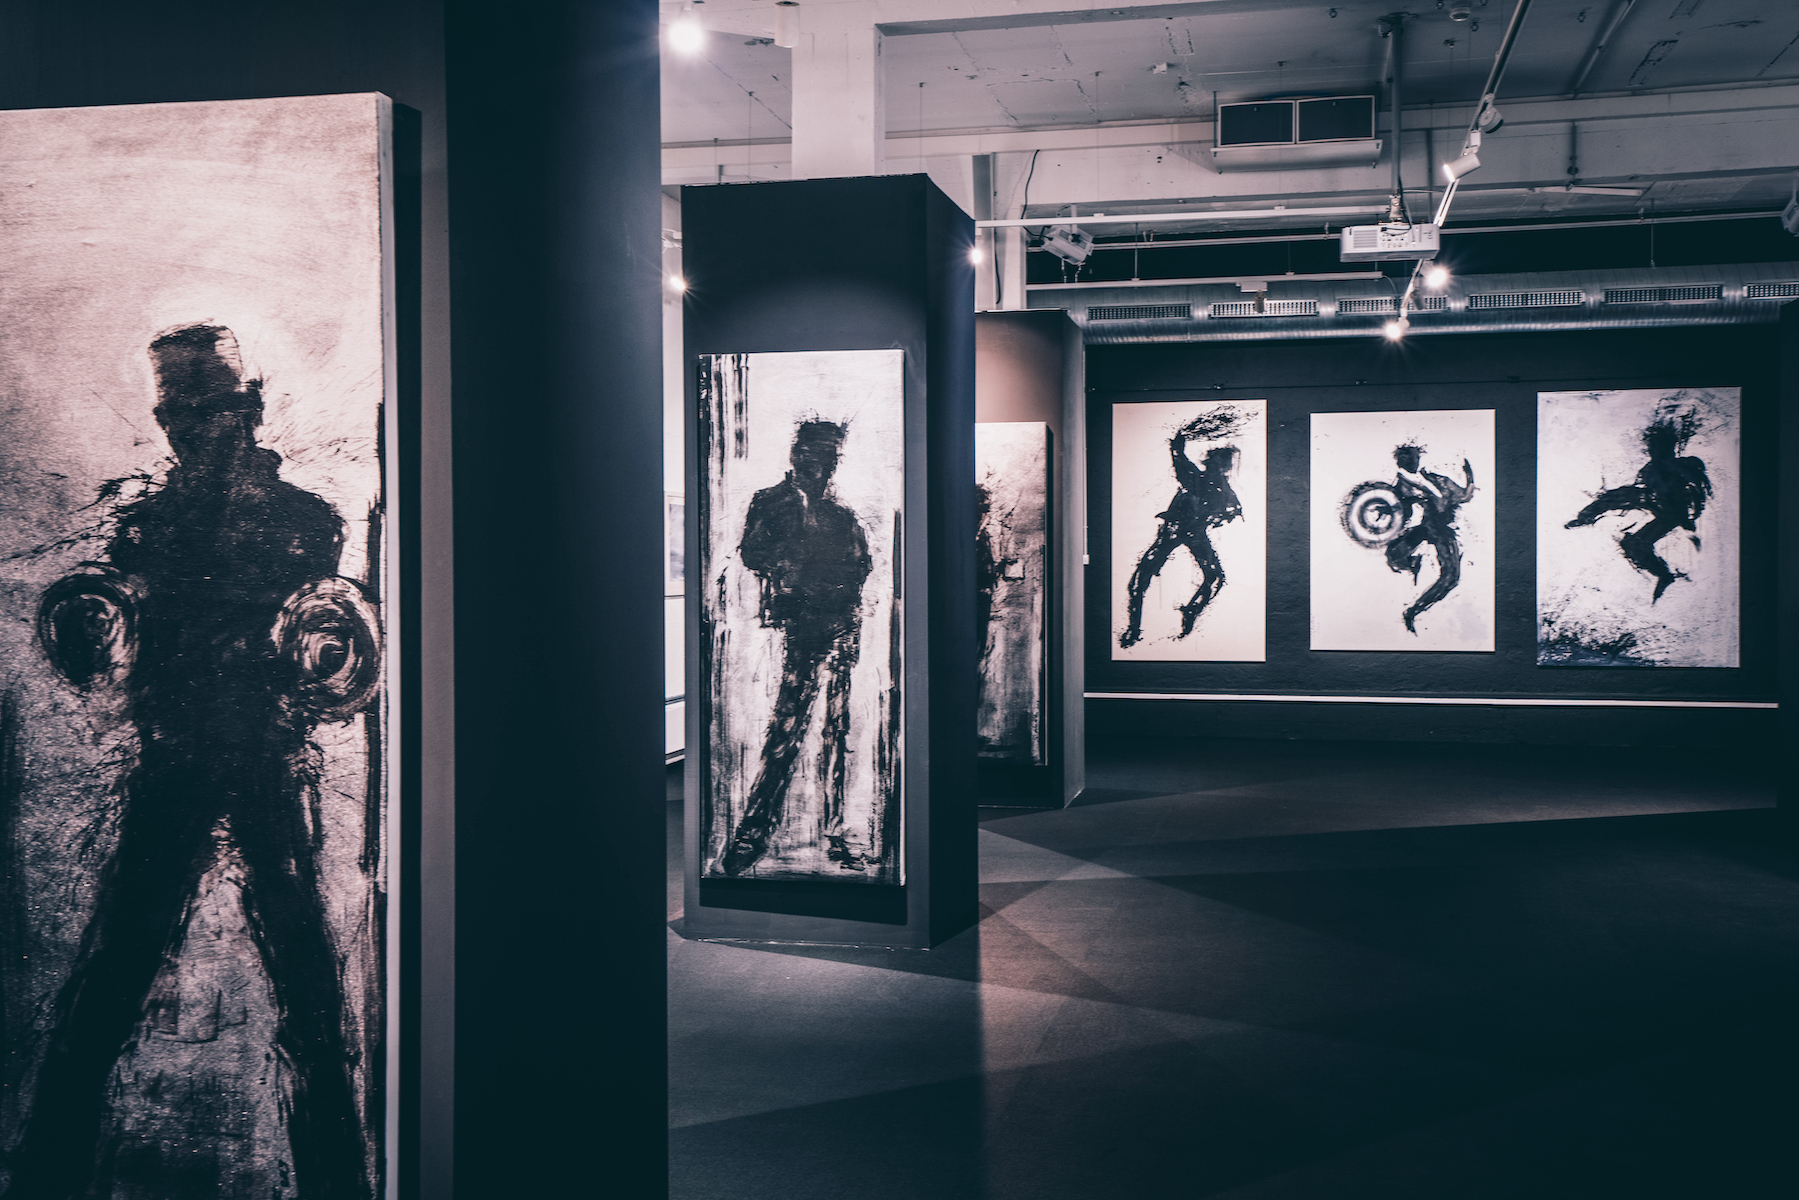 Die Schattenmänner im Keller des MUCA. – ©wunderland media GmbH